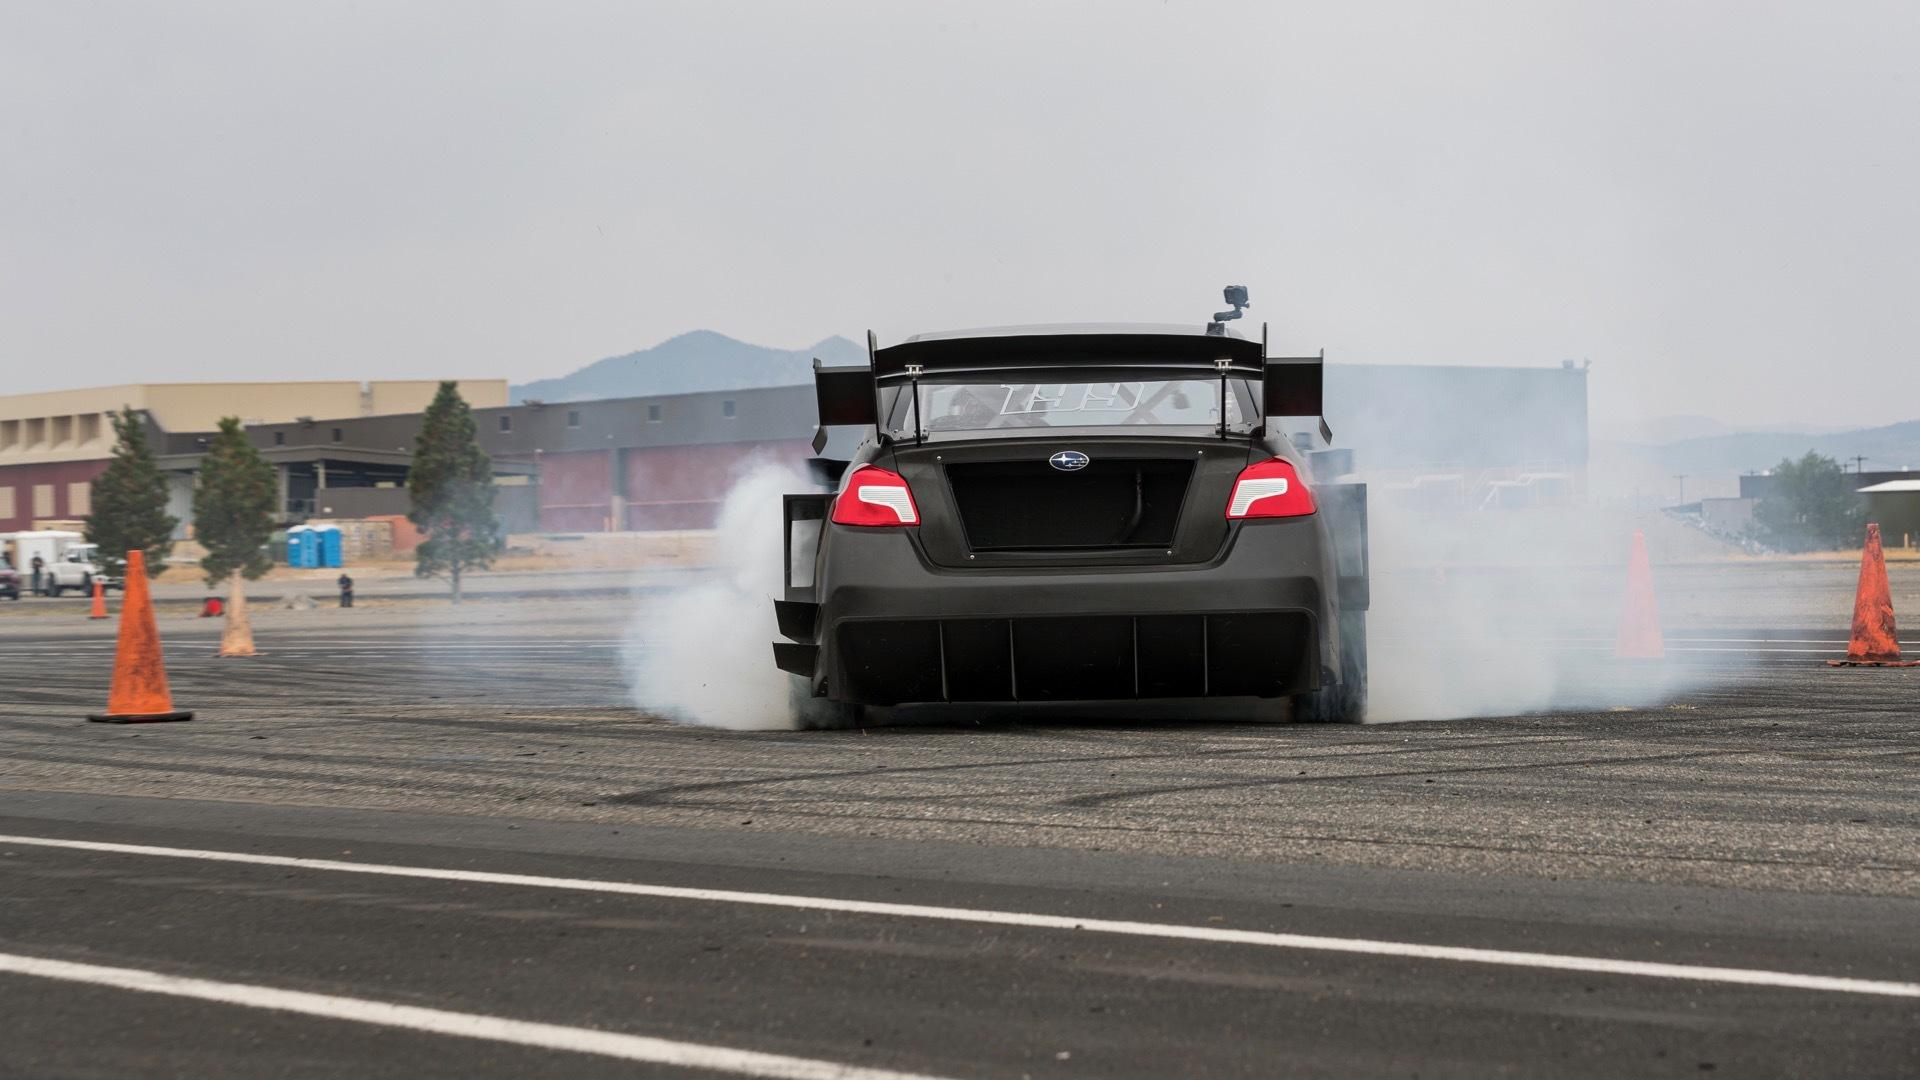 Subaru Launch Control: Road to Gymkhana